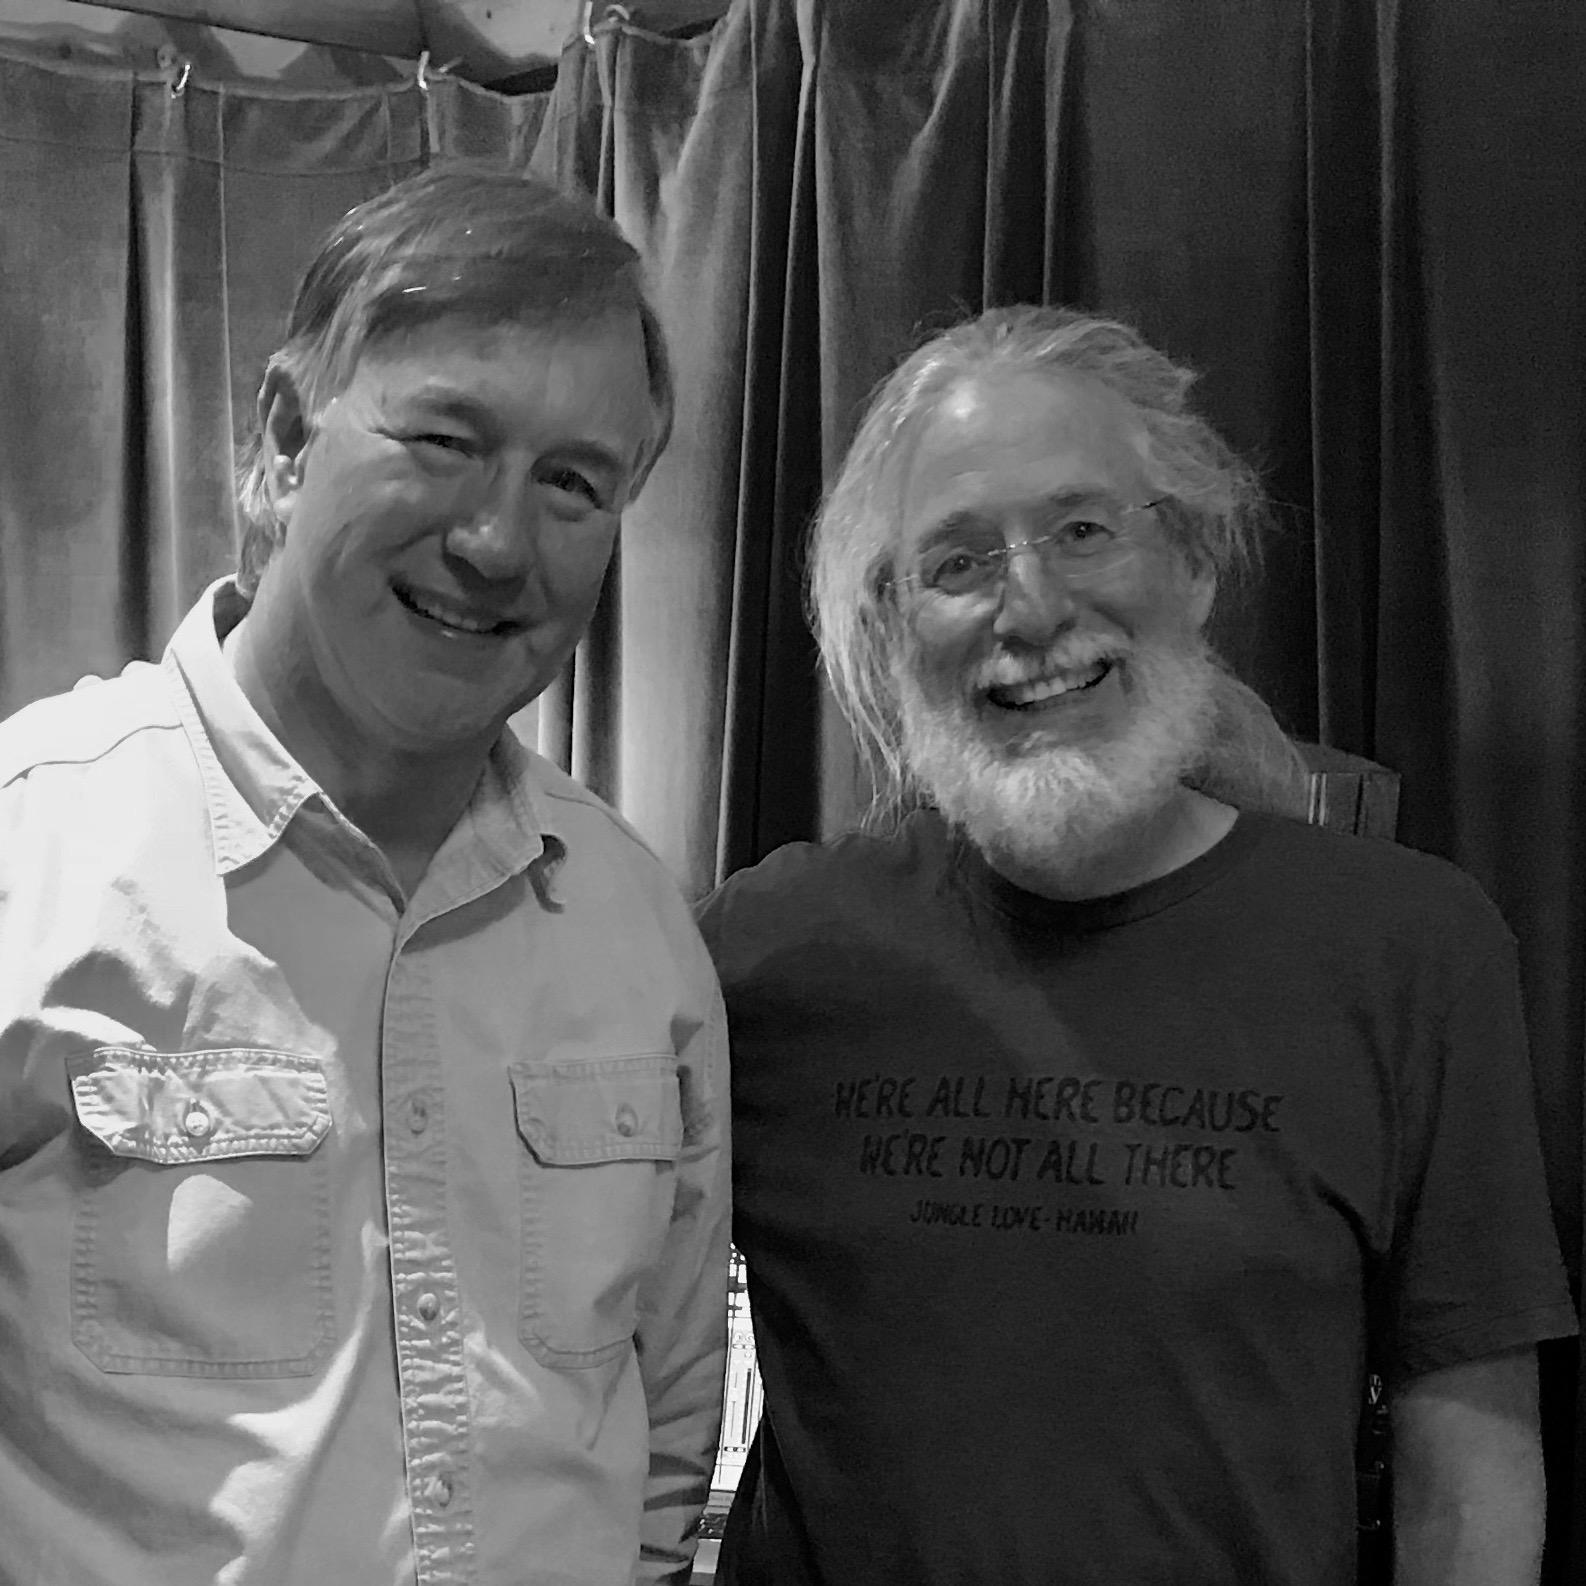 Walt and John